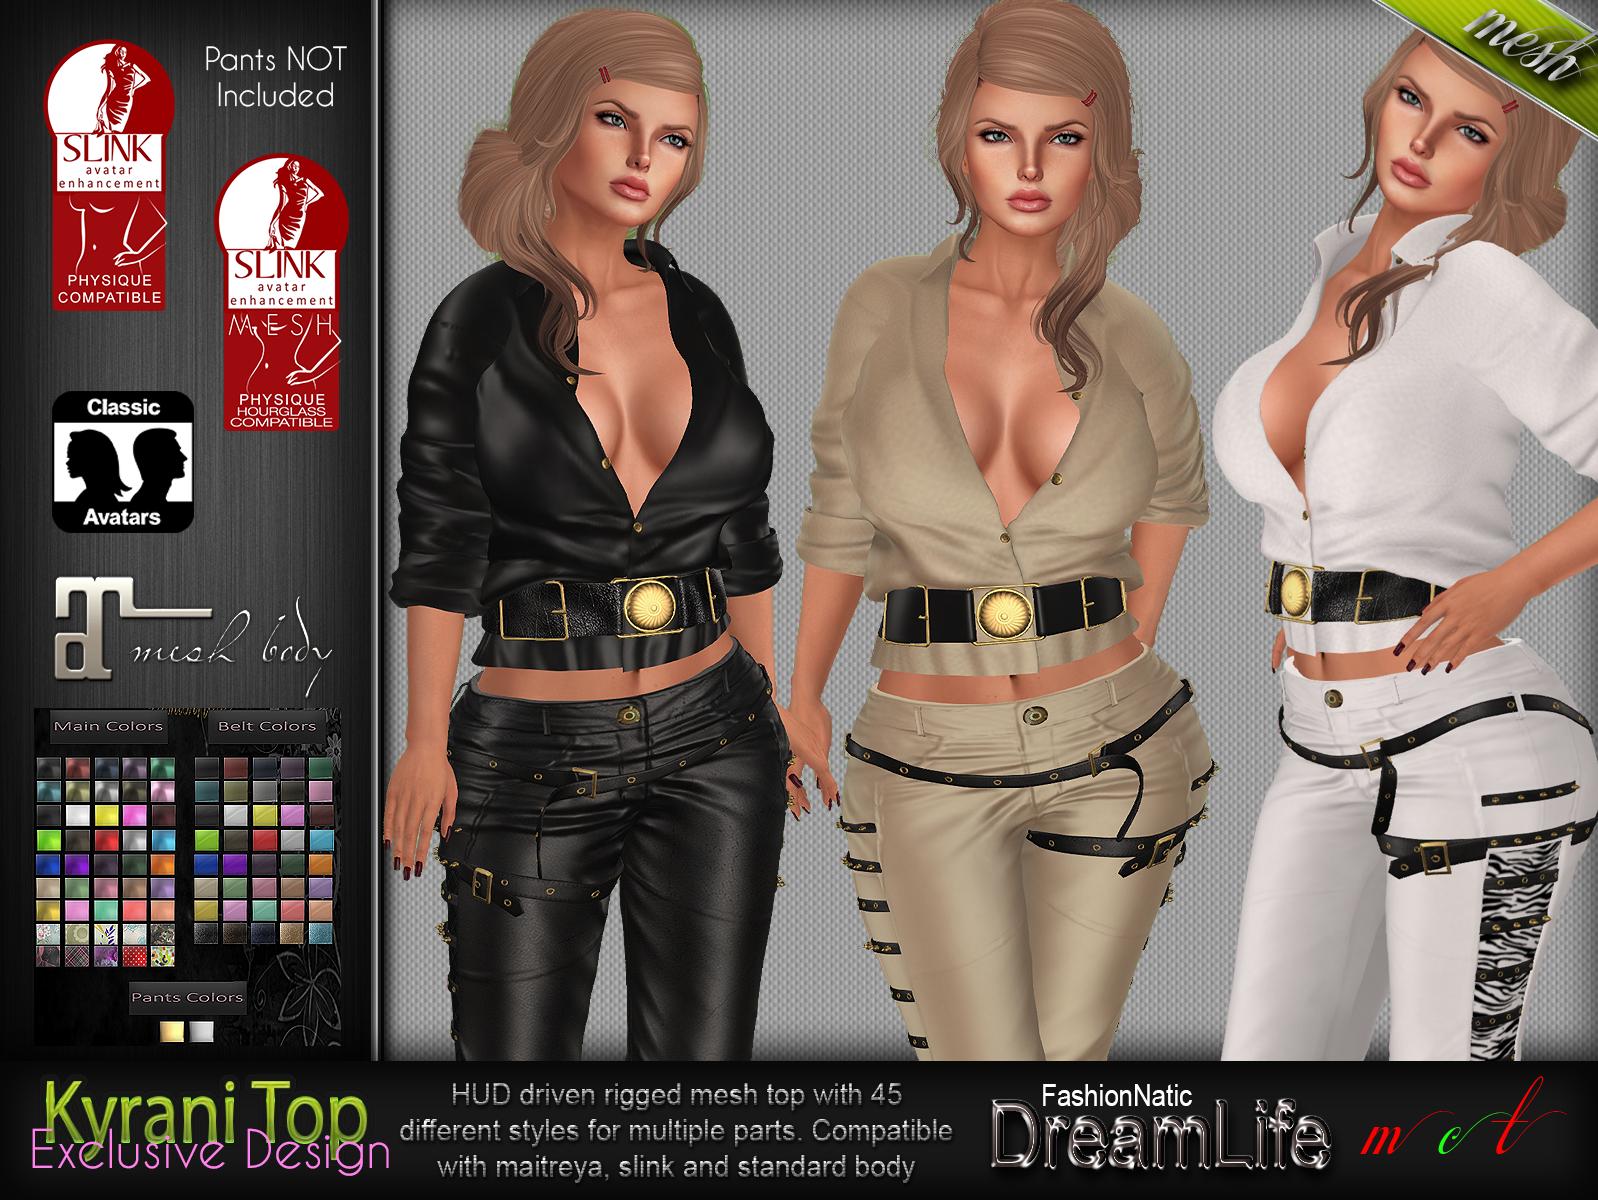 https://marketplace.secondlife.com/p/MESH-Kyrani-Top-Rigged-HUD-Driven-DreamLife-FashionNatic/10286866